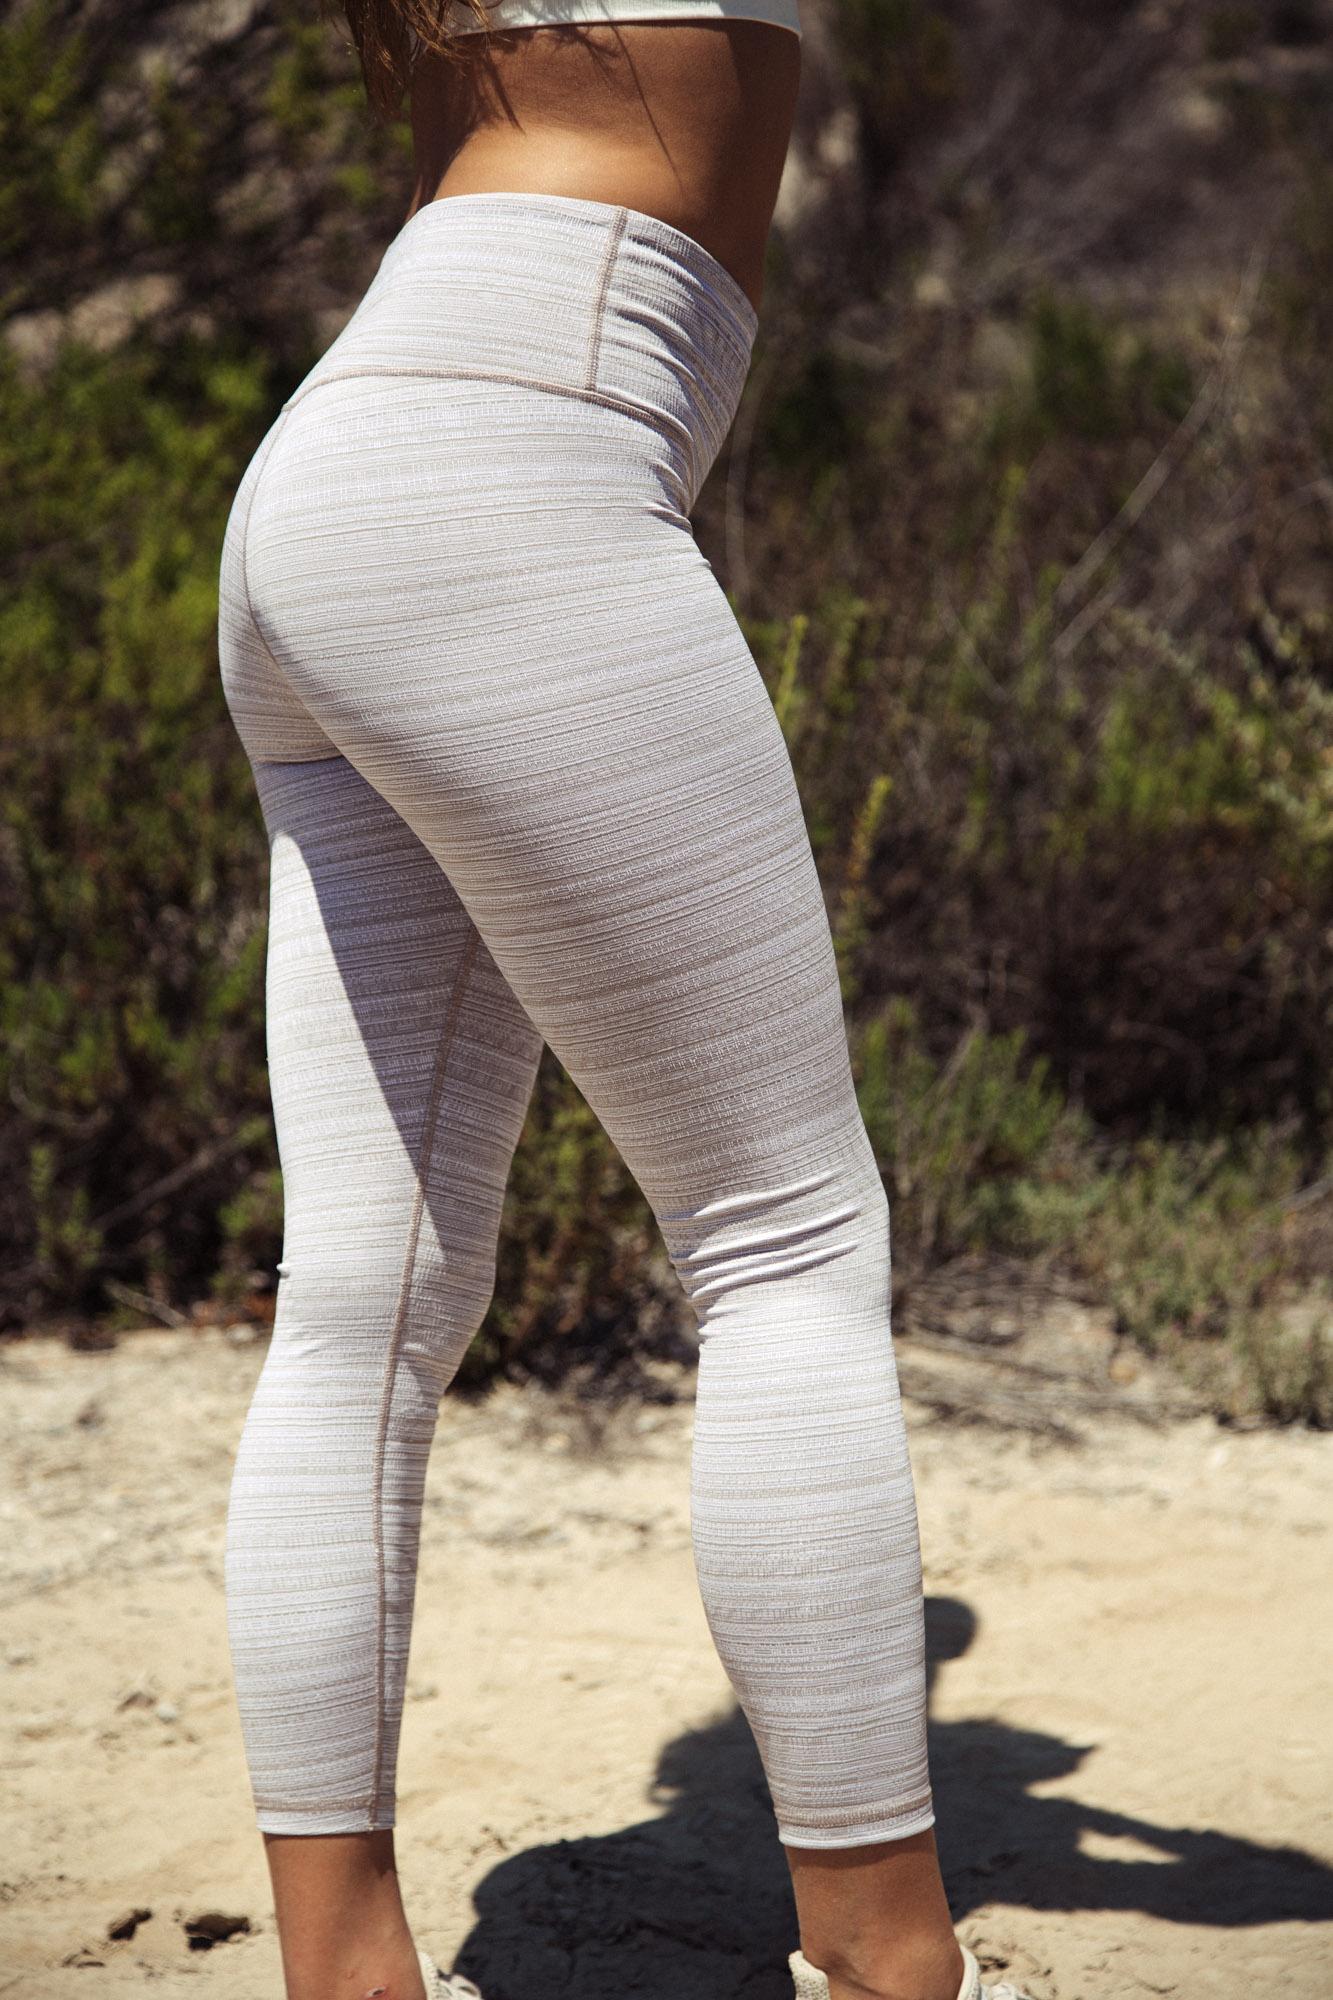 386eaaac1c Athleta Size S Yoga Pants Athleta Size S Yoga Pants t